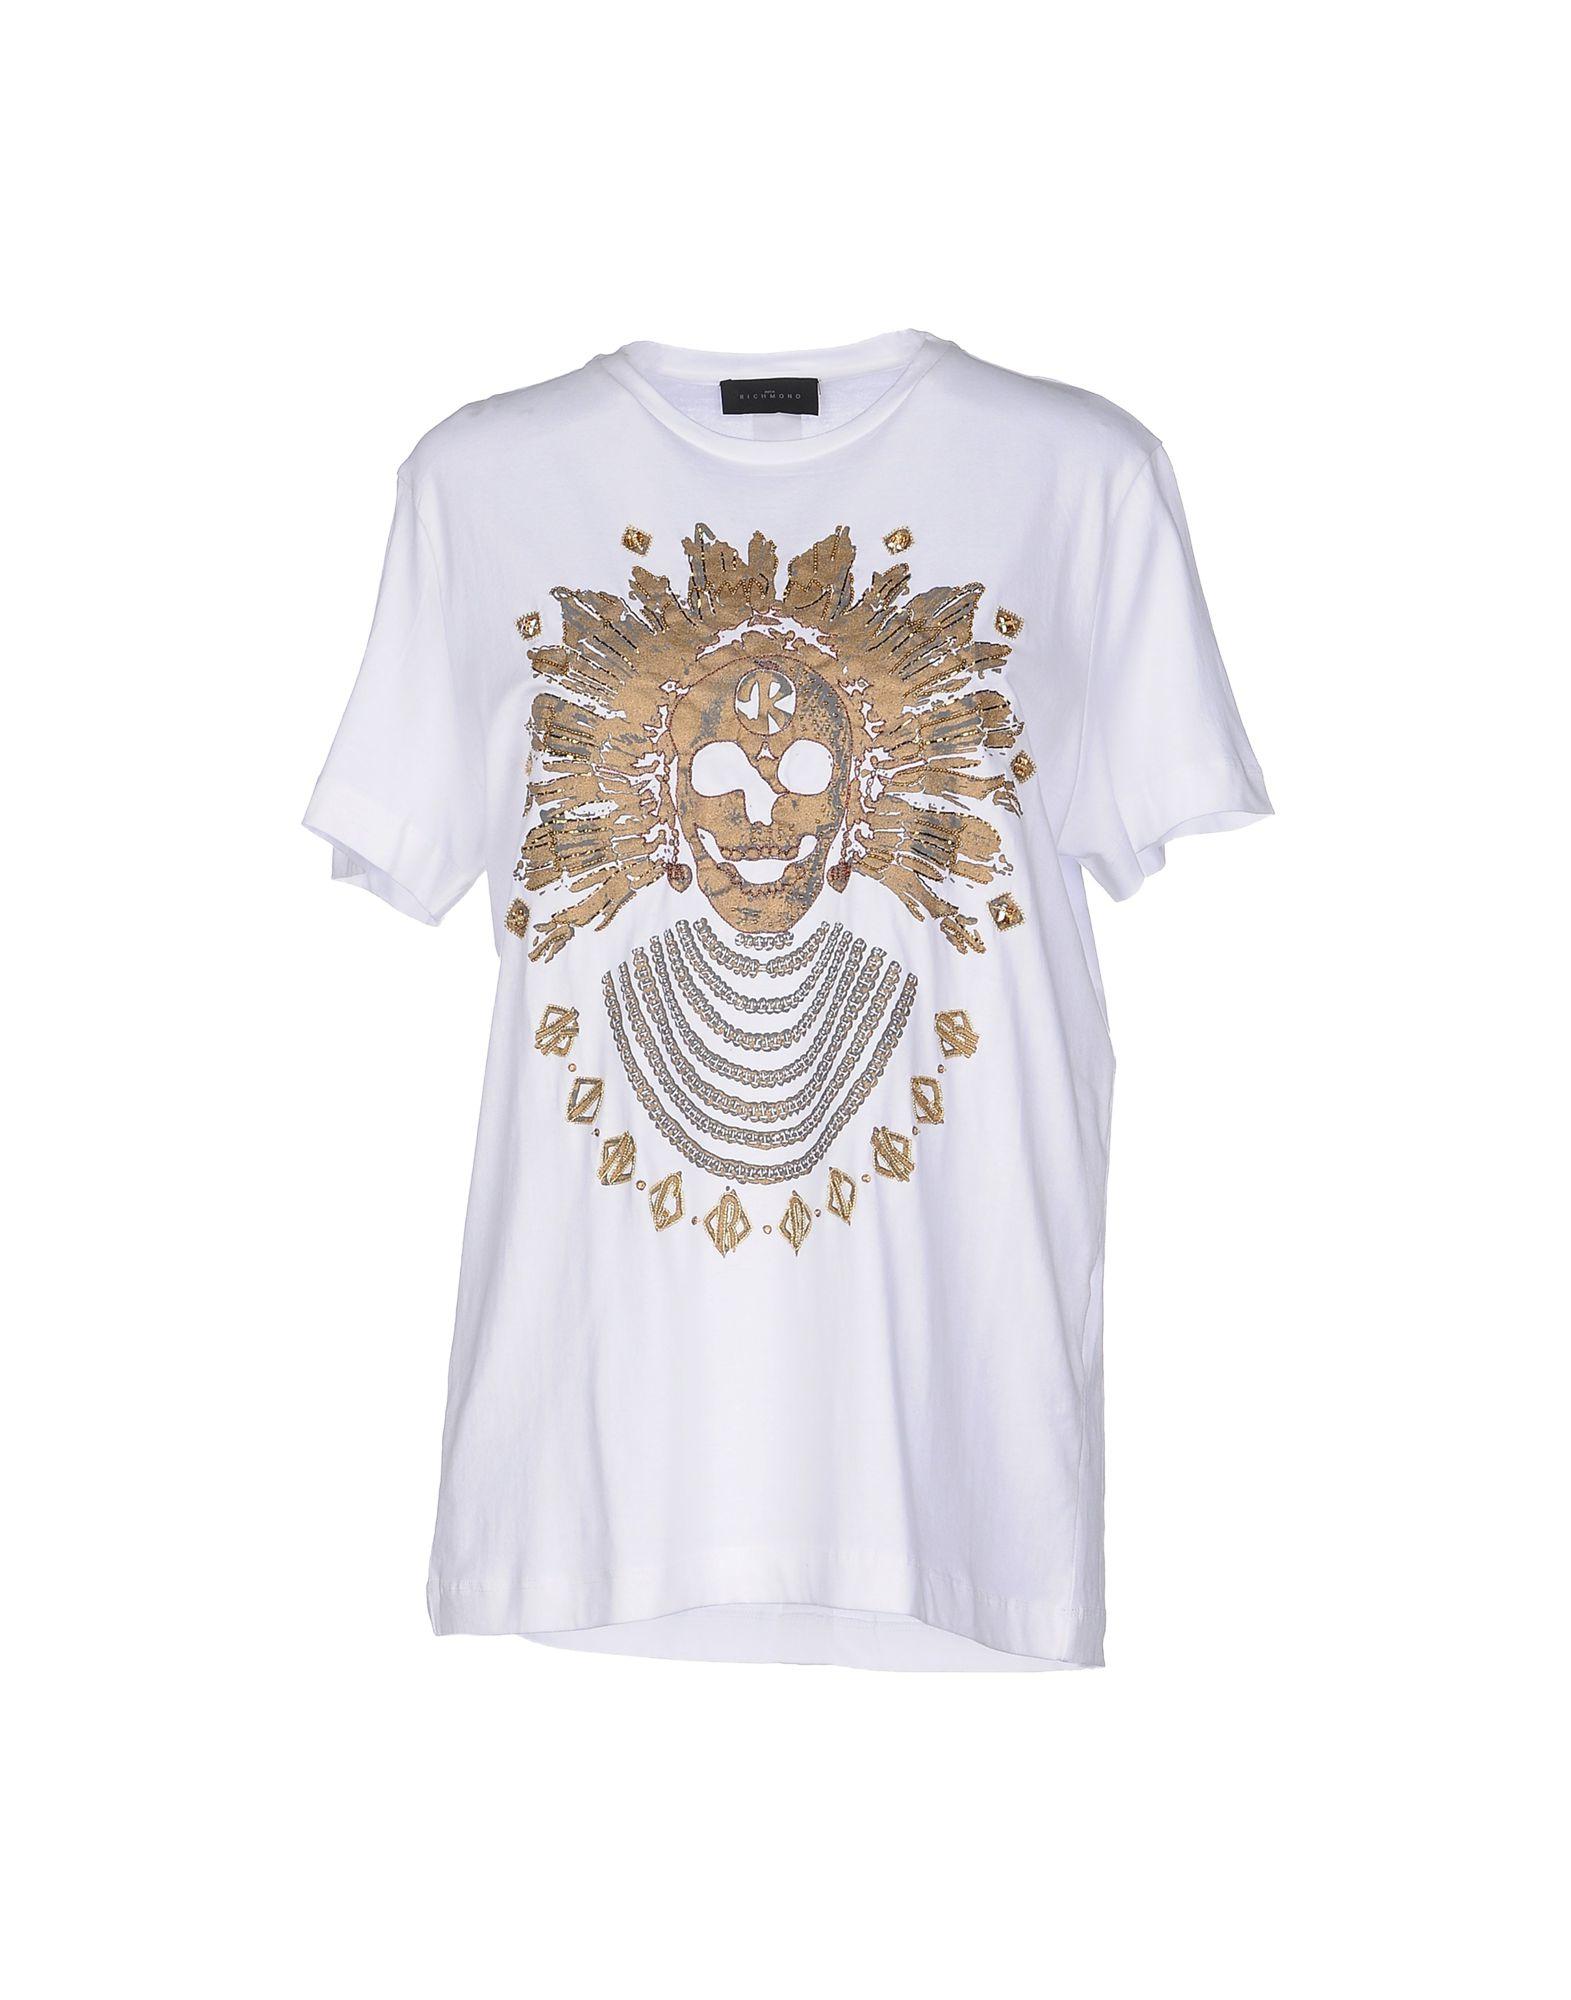 John richmond t shirt in multicolor white lyst for Richmond t shirt printing